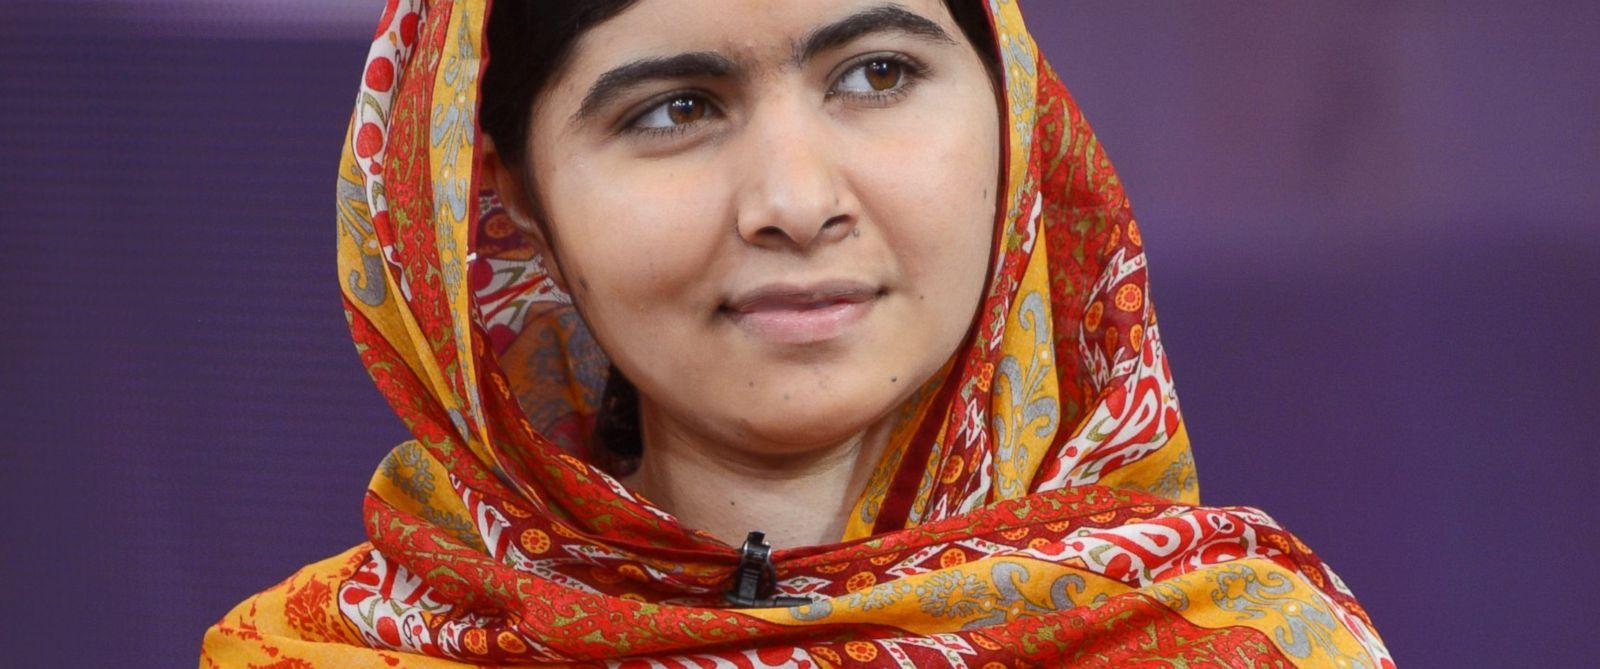 PHOTO: Pakistani teenager and education activist Malala Yousafzai talks to Amy Robach on Good Morning America, Aug. 18, 2014.